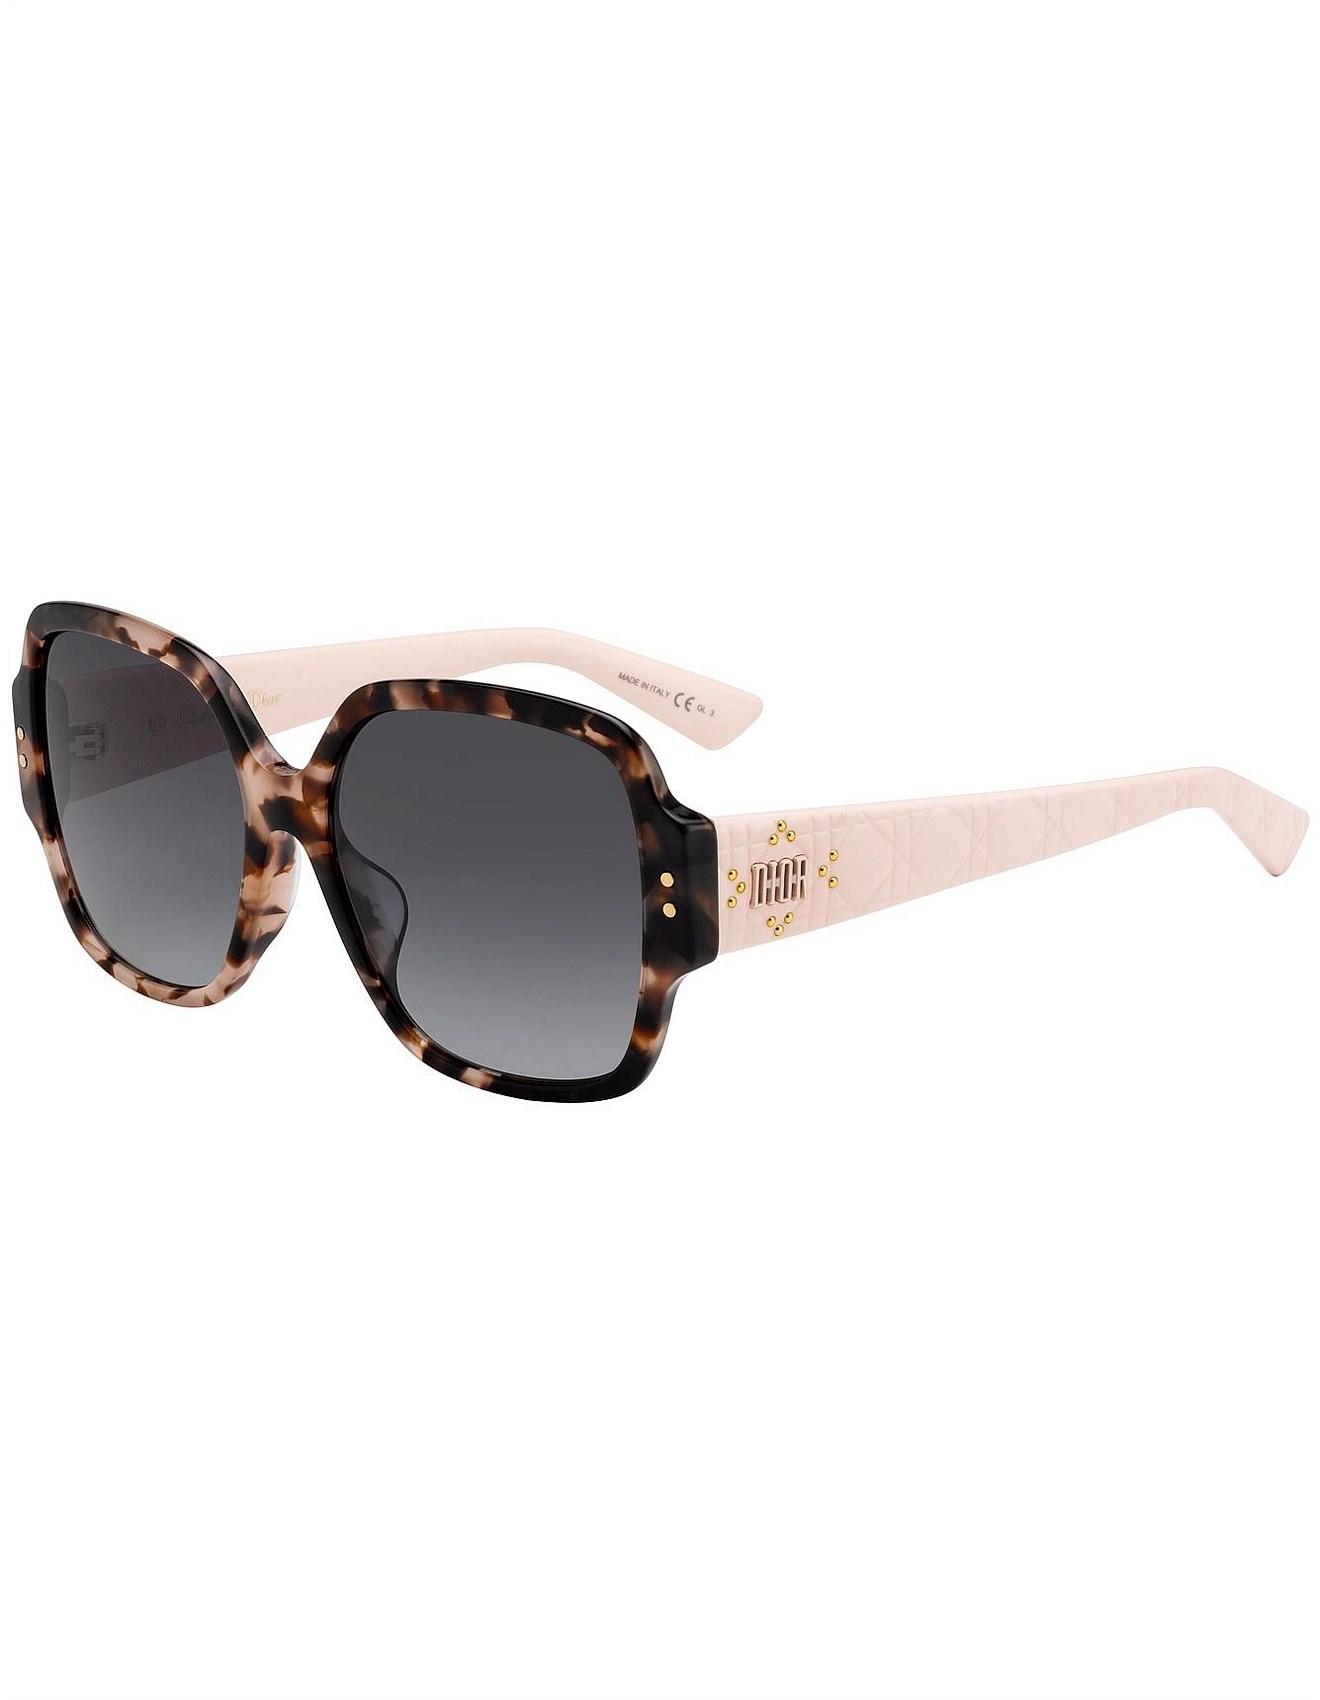 be8b51ab183f Women s Square Sunglasses